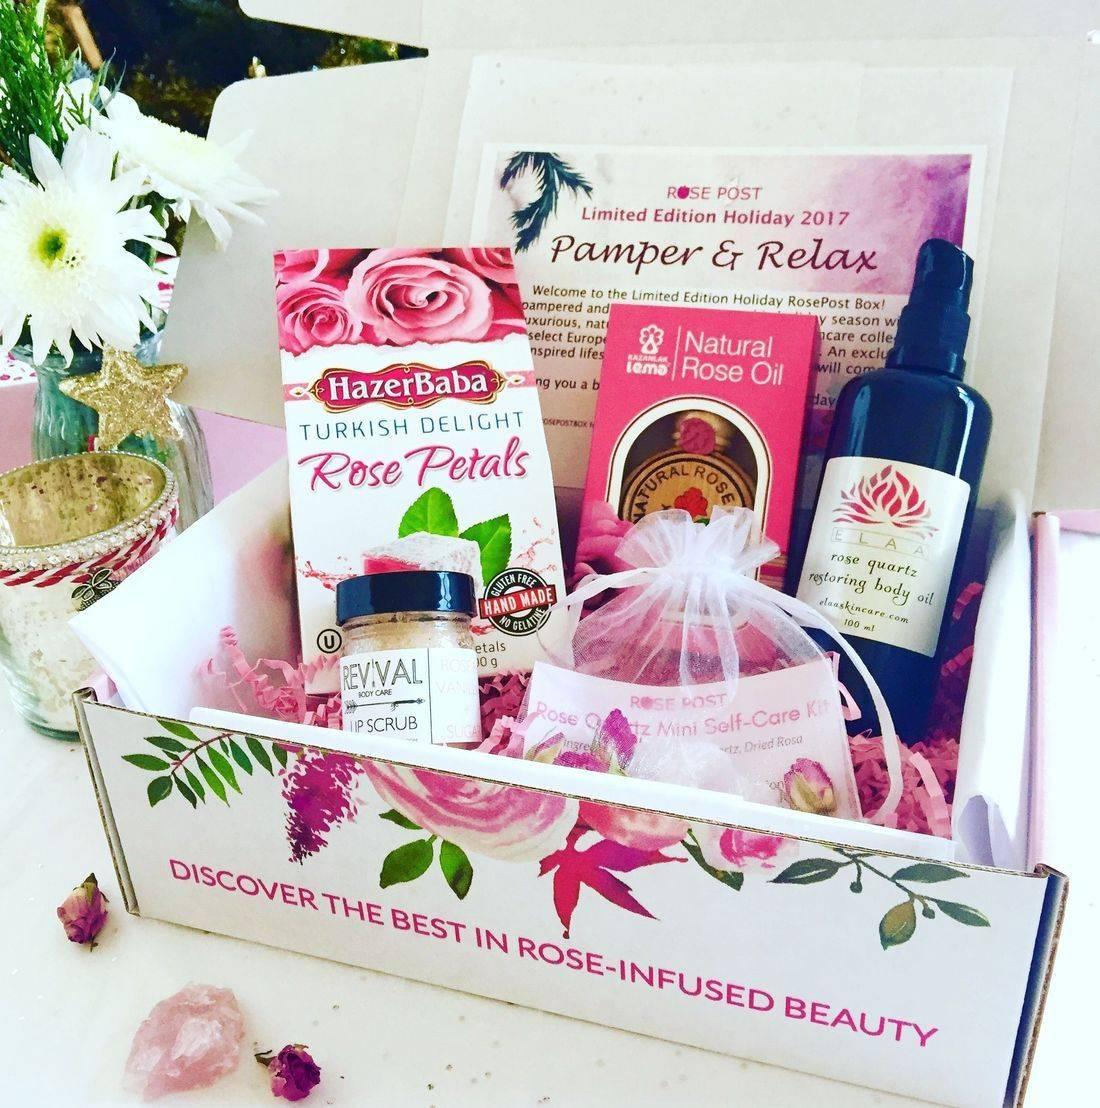 RosePost Limited Edition Holiday Box, RosePost Box, Limited Edition Box